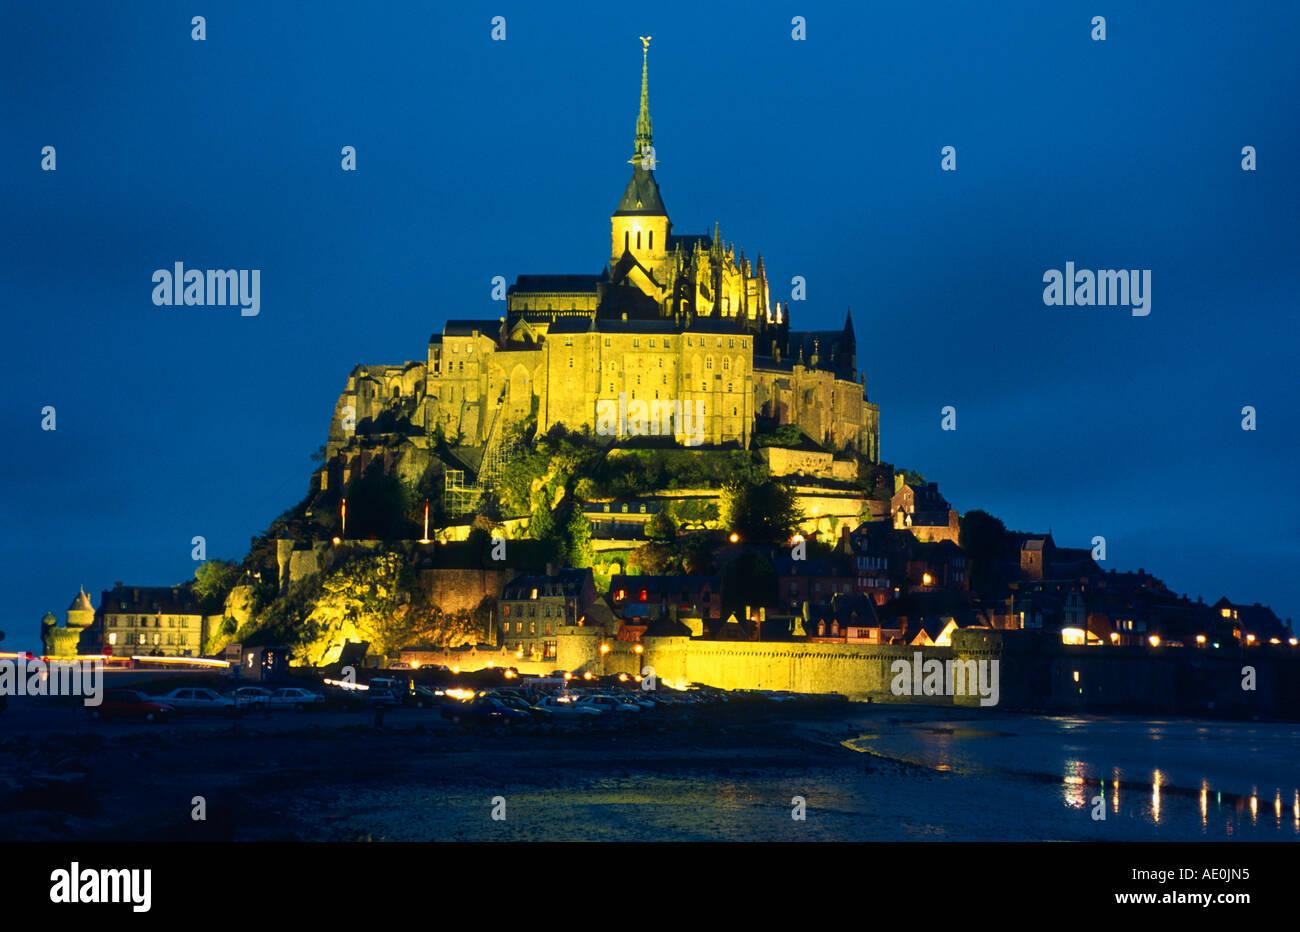 Normandie Mont St Michel Abteiberg Nachtaufnahme francia Imagen De Stock